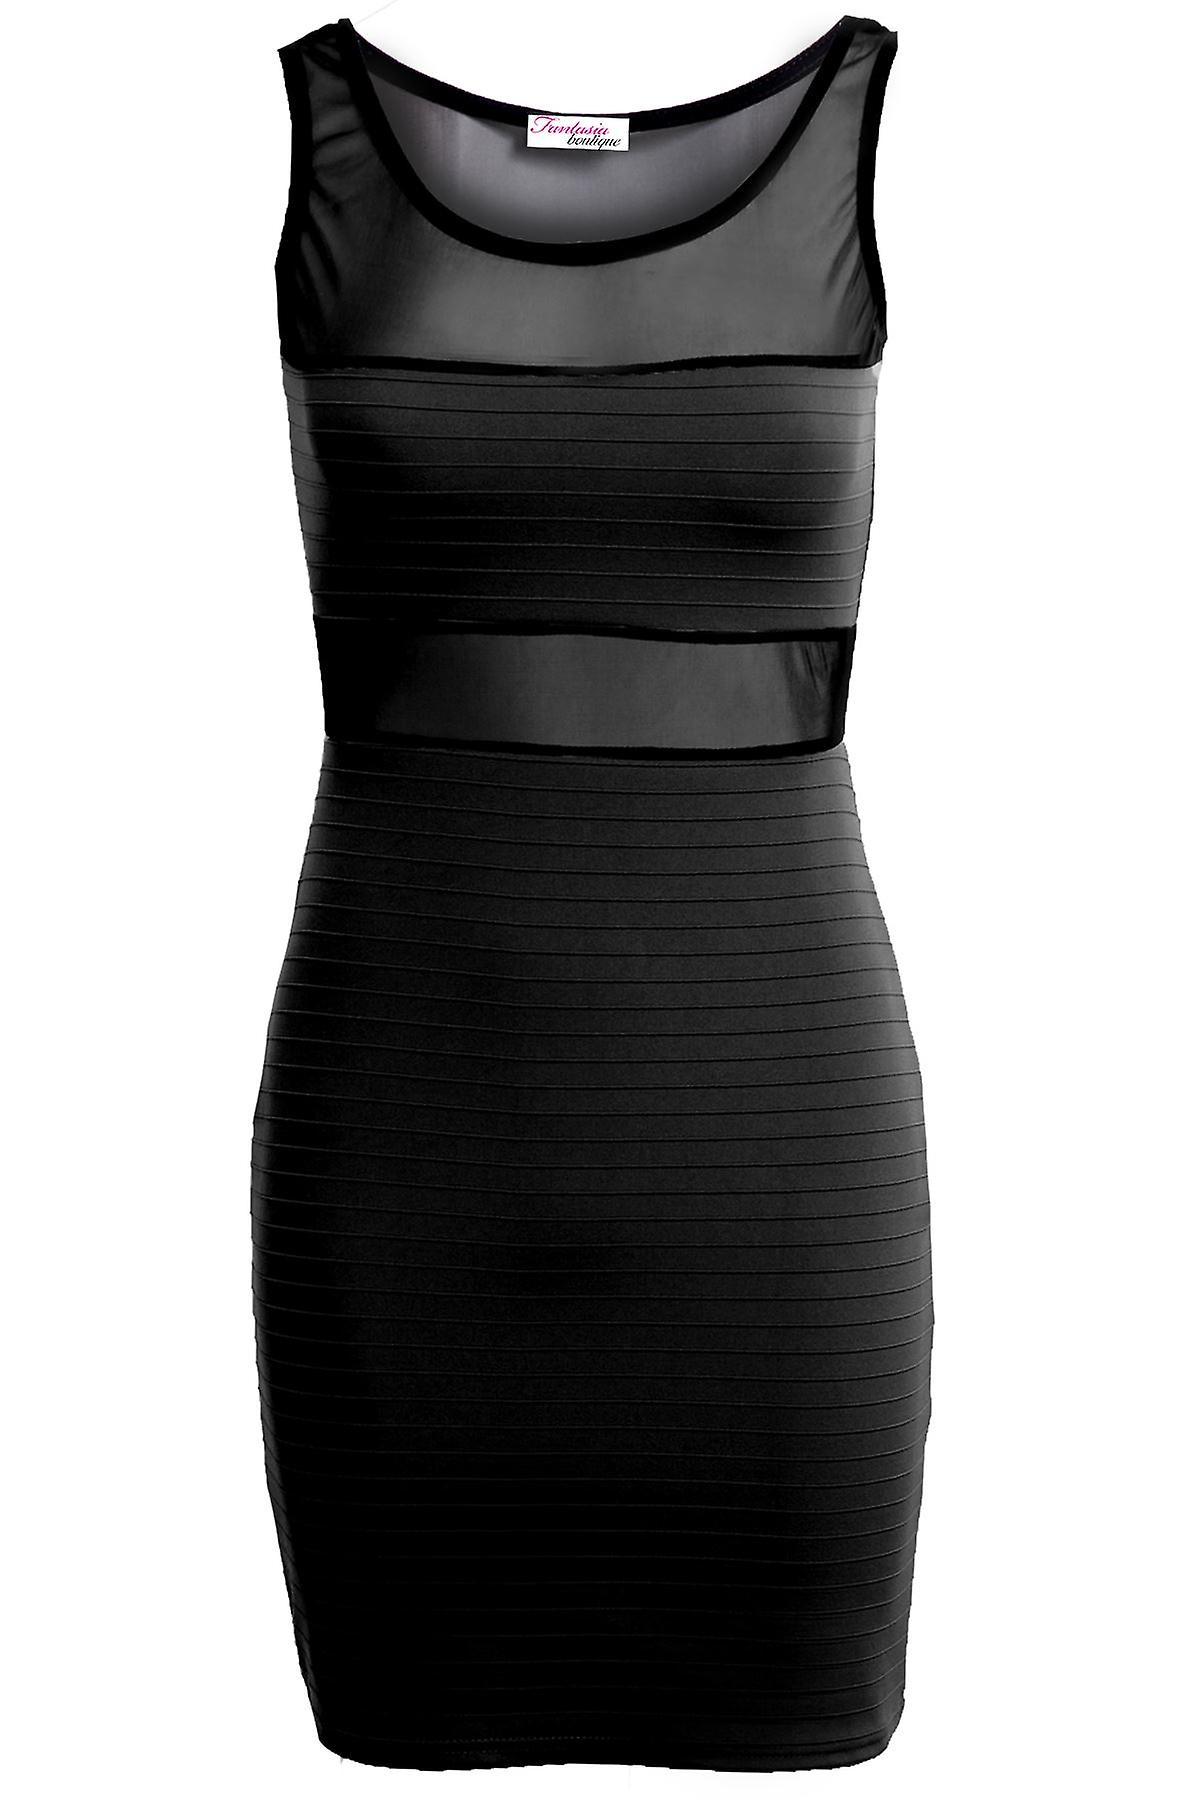 New Ladies Sleeveless Mesh Ribbed Contrast Women's Bodycon Dress